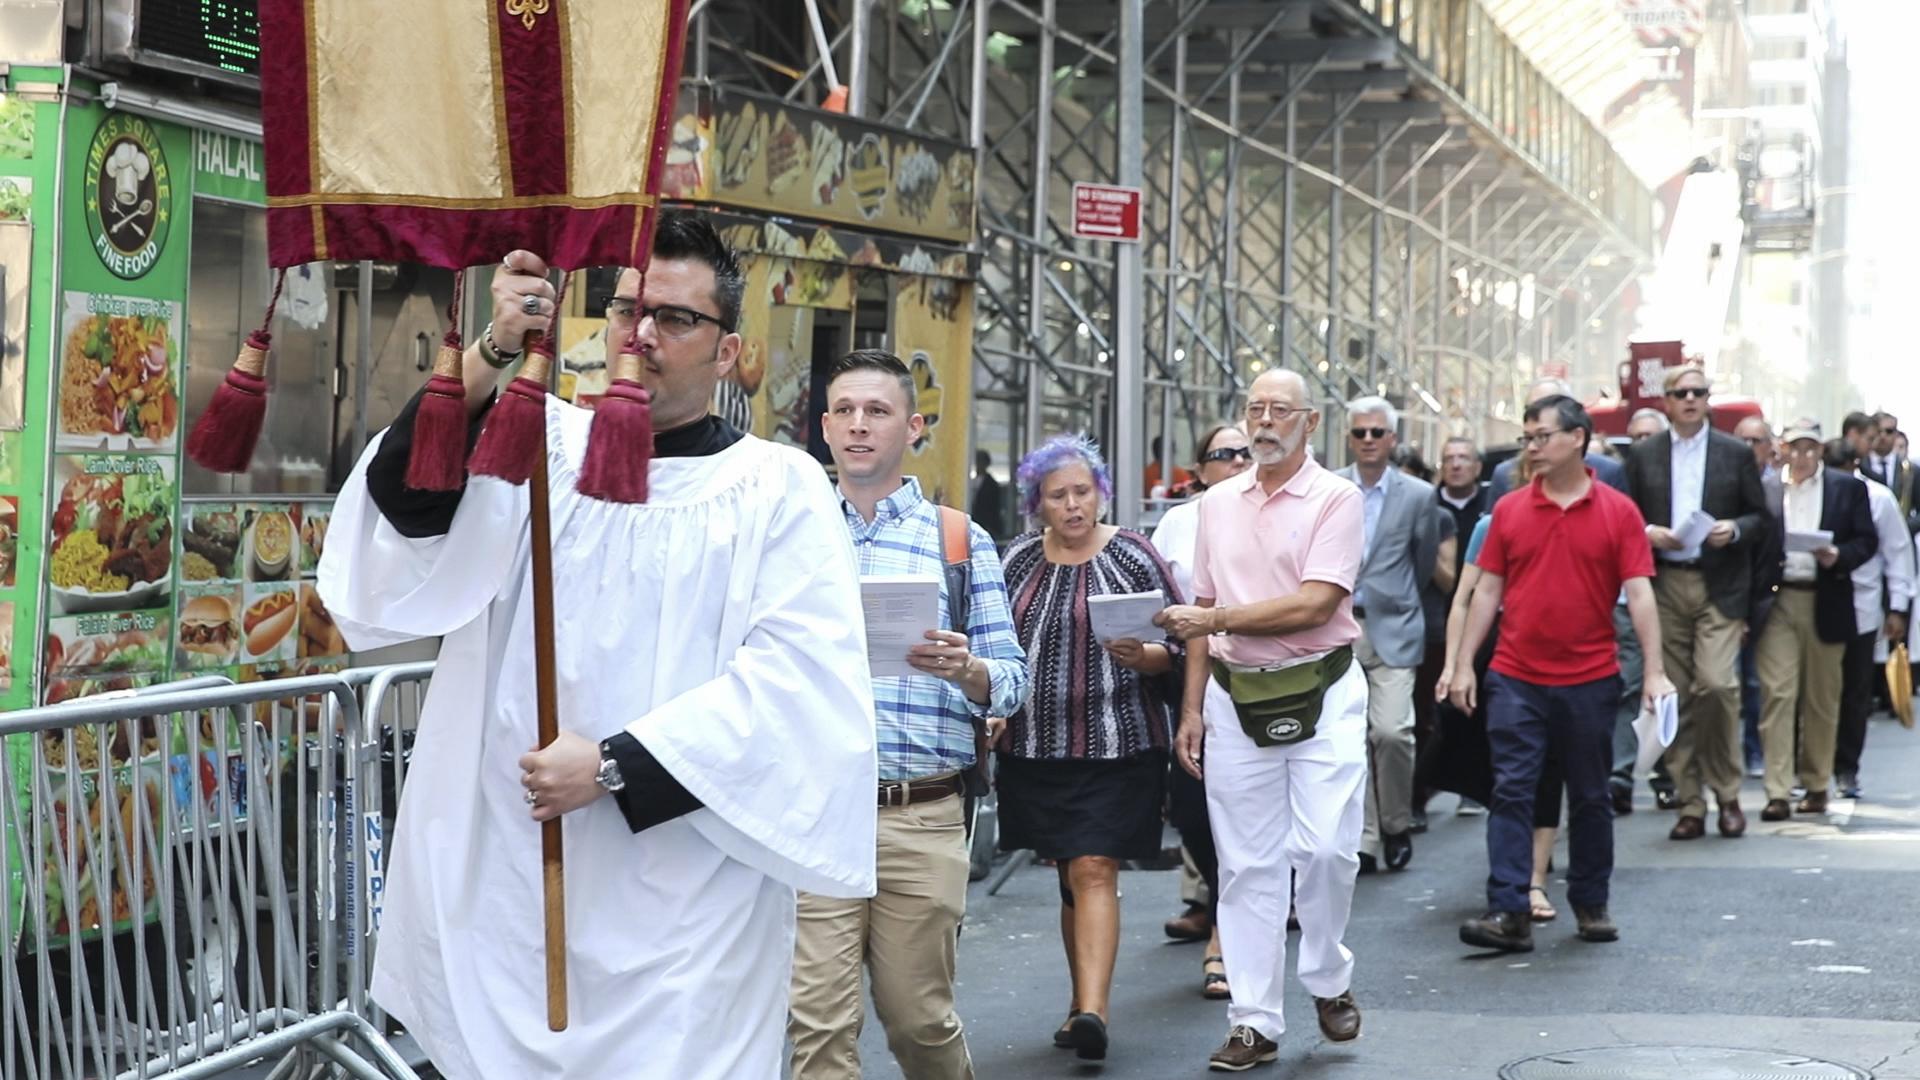 The congregation followed the Sacrament, led by a server bearing a banner.  Photo: Pamela Pasco